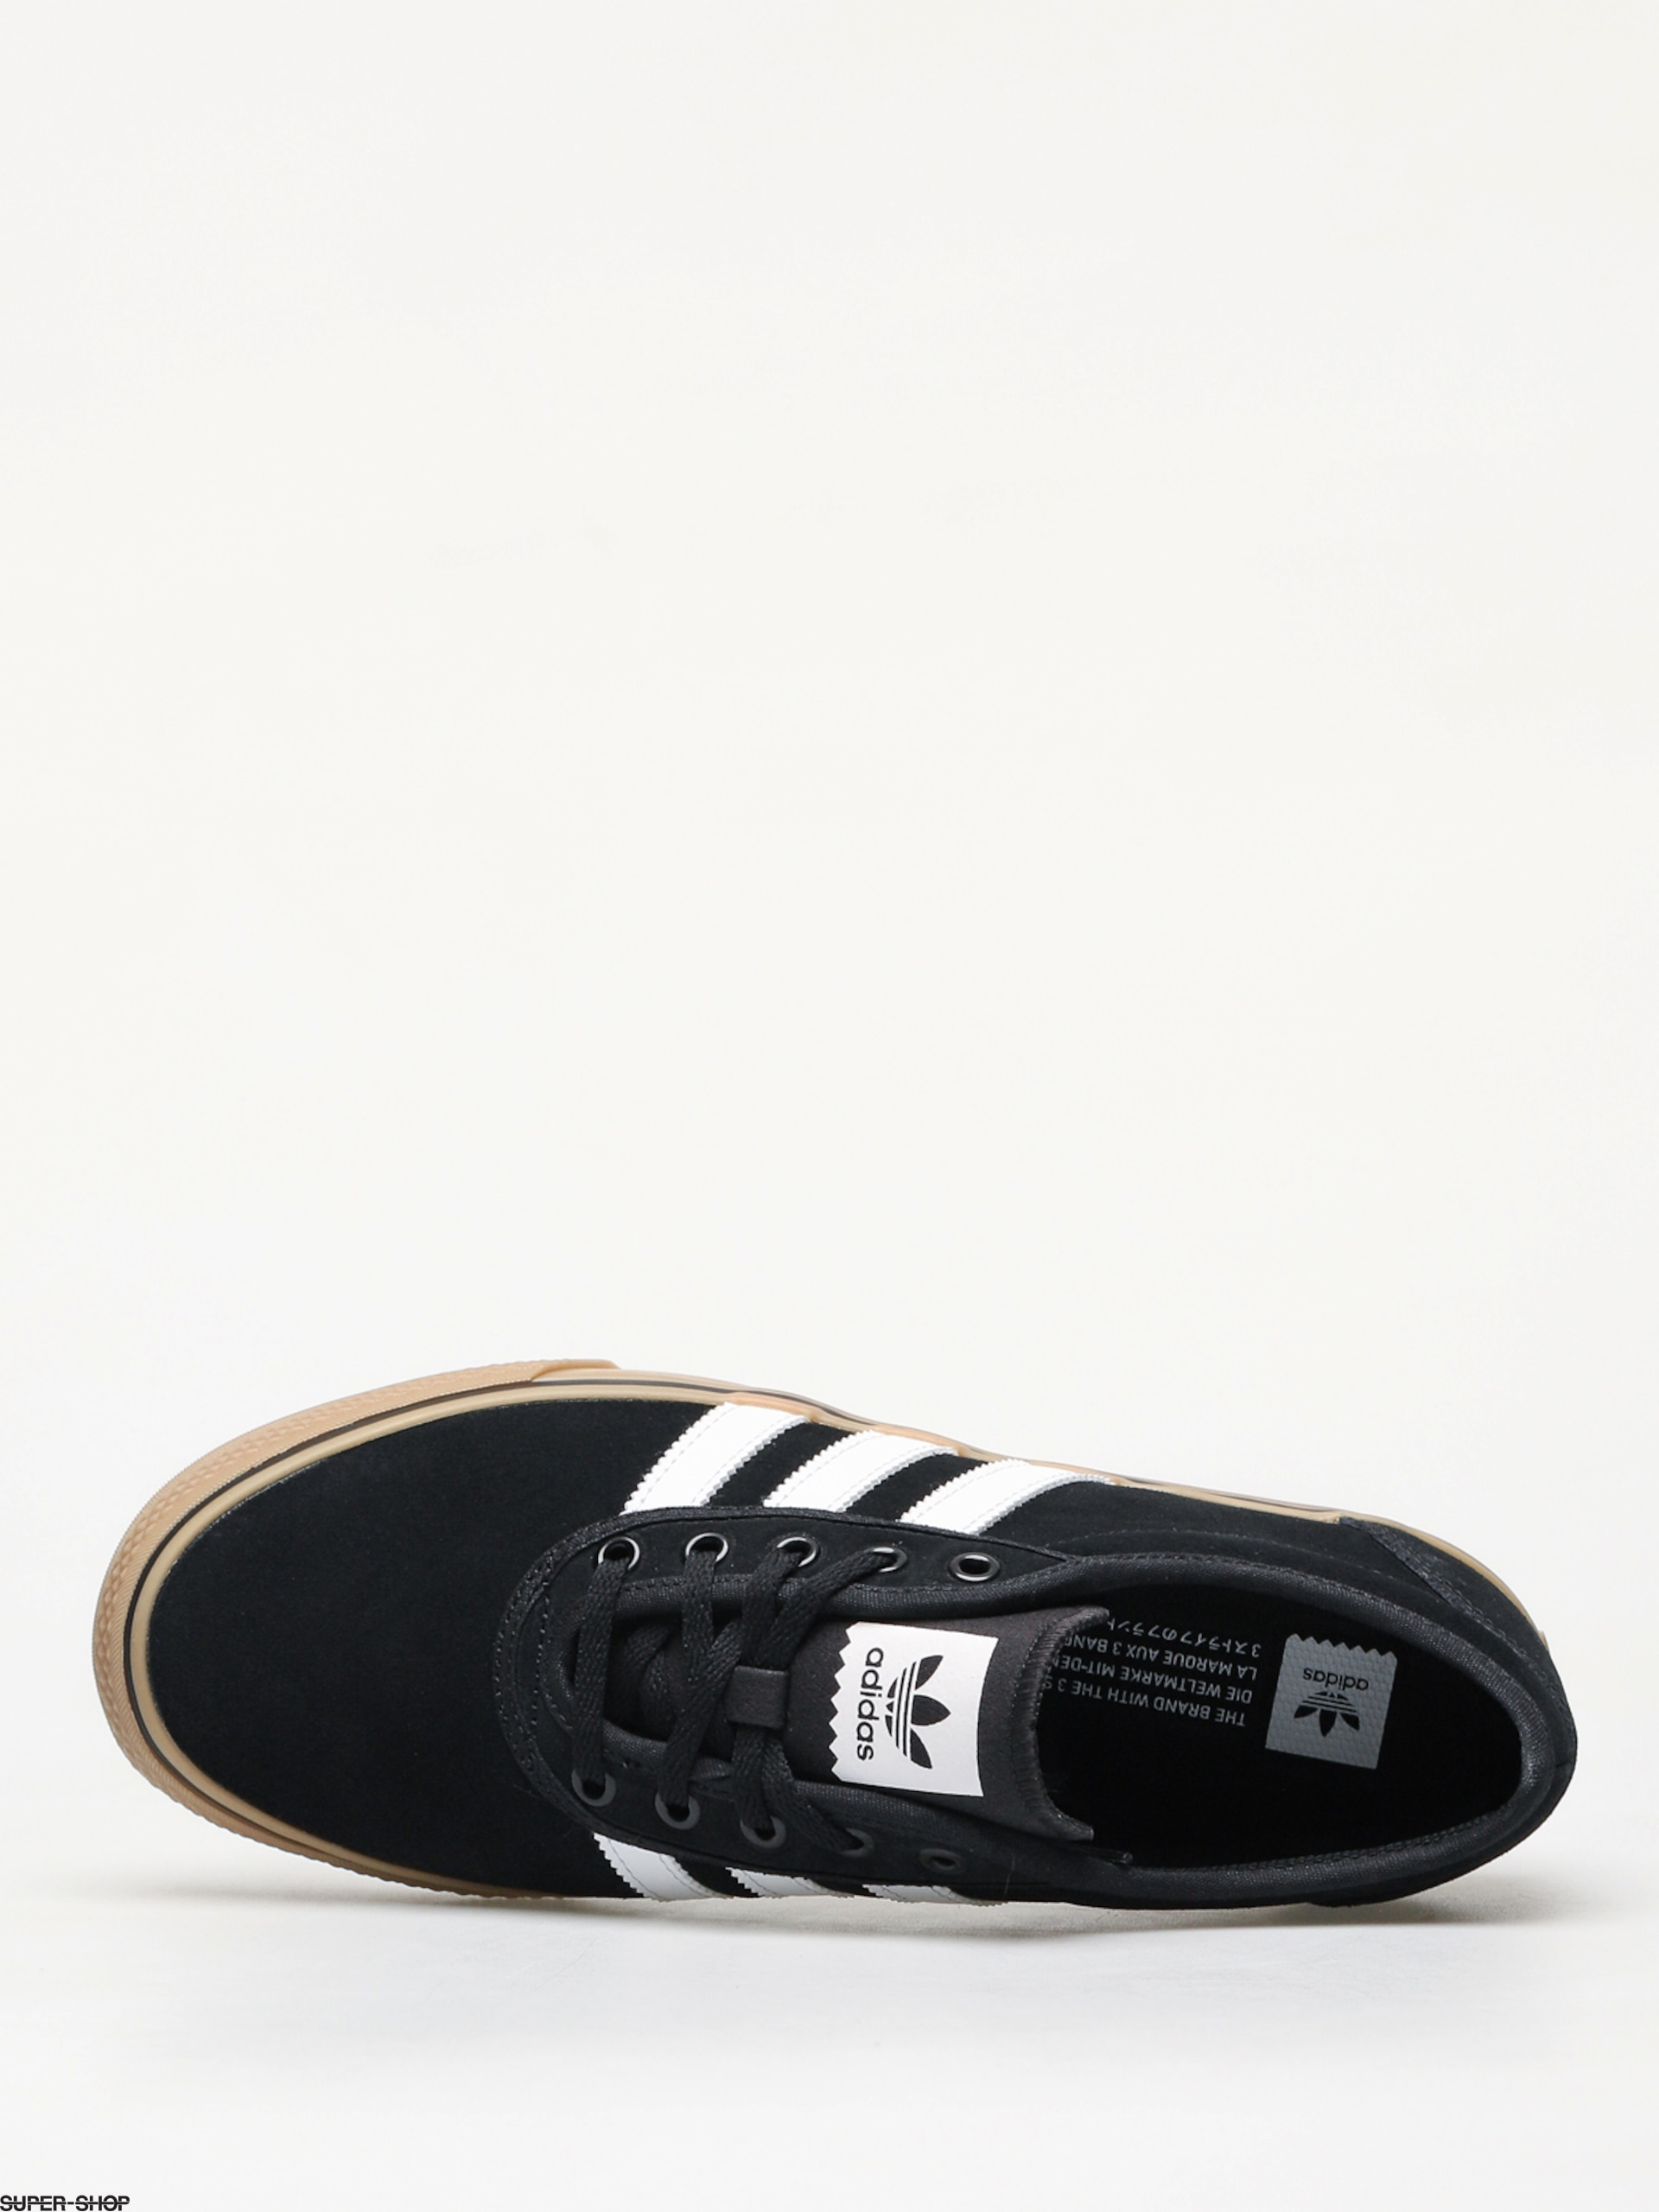 Sentirse mal Aturdir Se convierte en  adidas Adi Ease Shoes (core black/ftwr white/gum4)